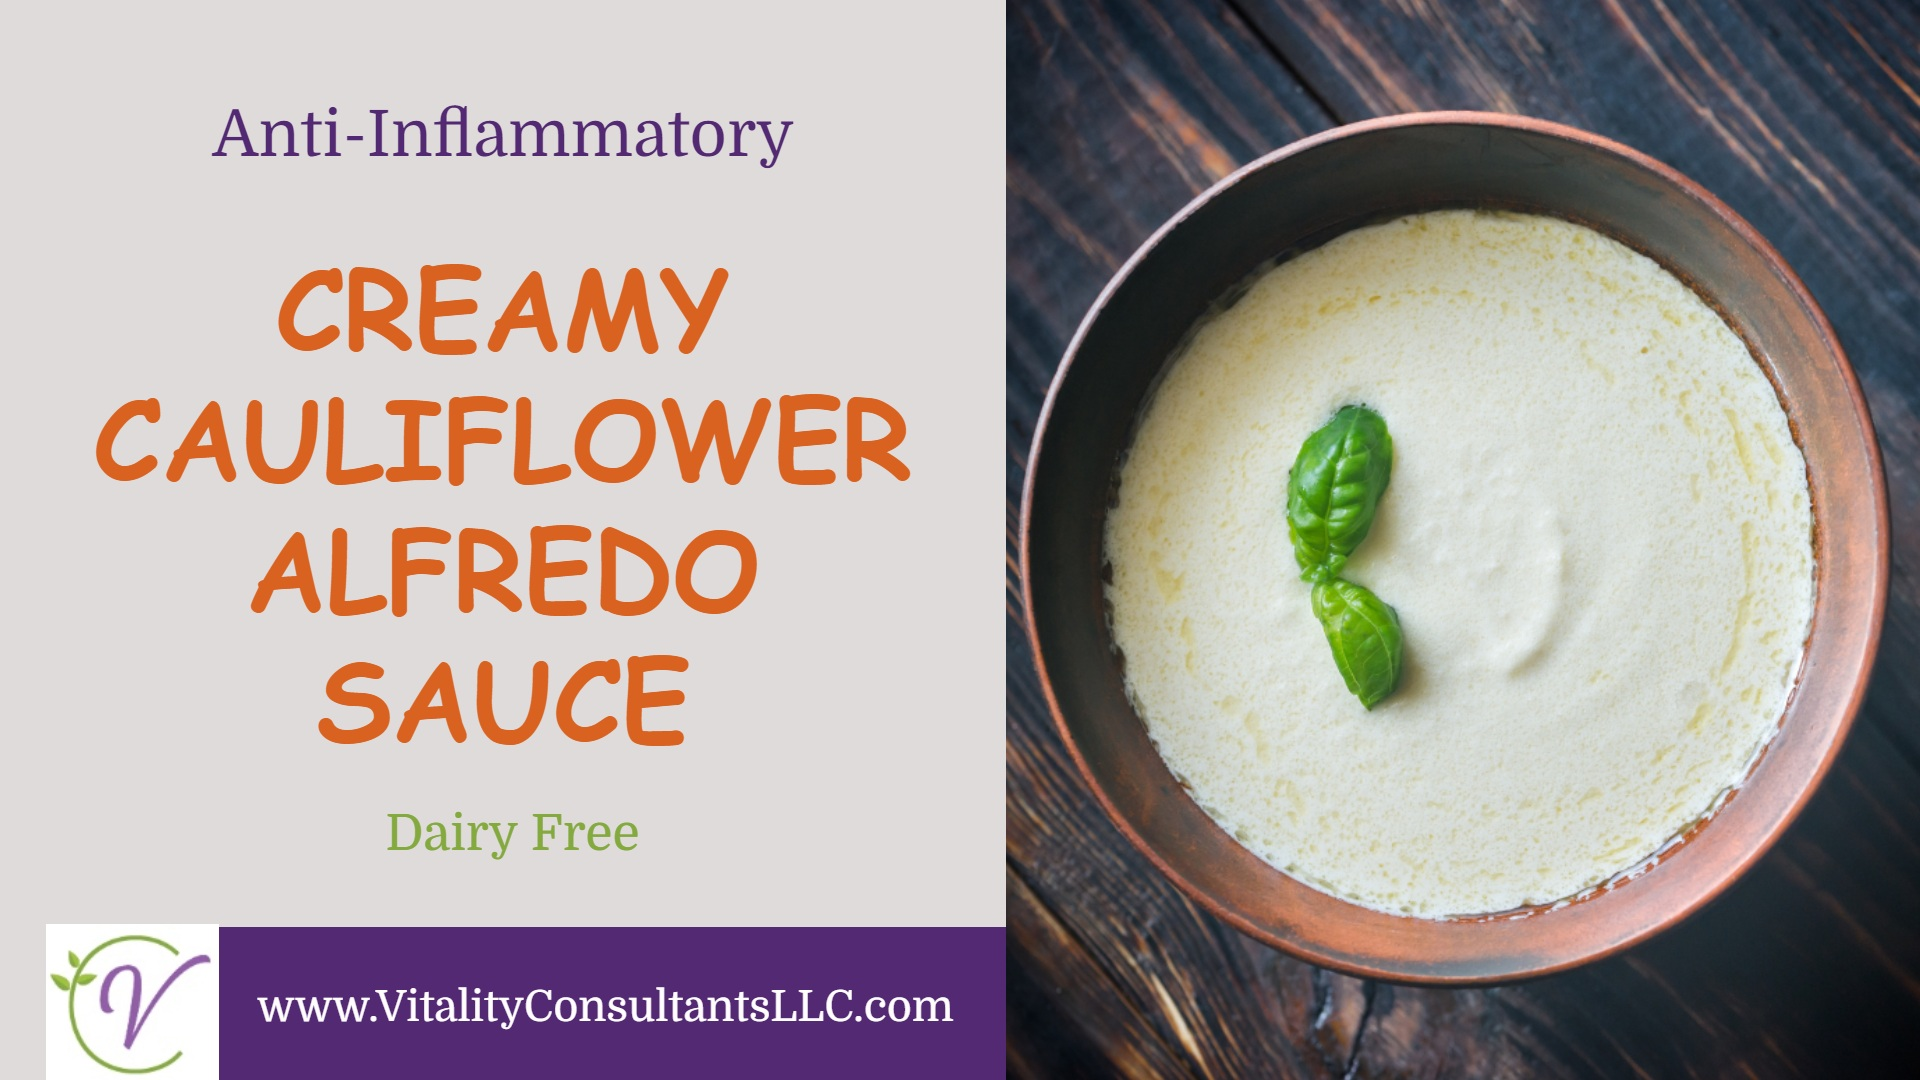 Creamy Cauliflower Alfredo Sauce